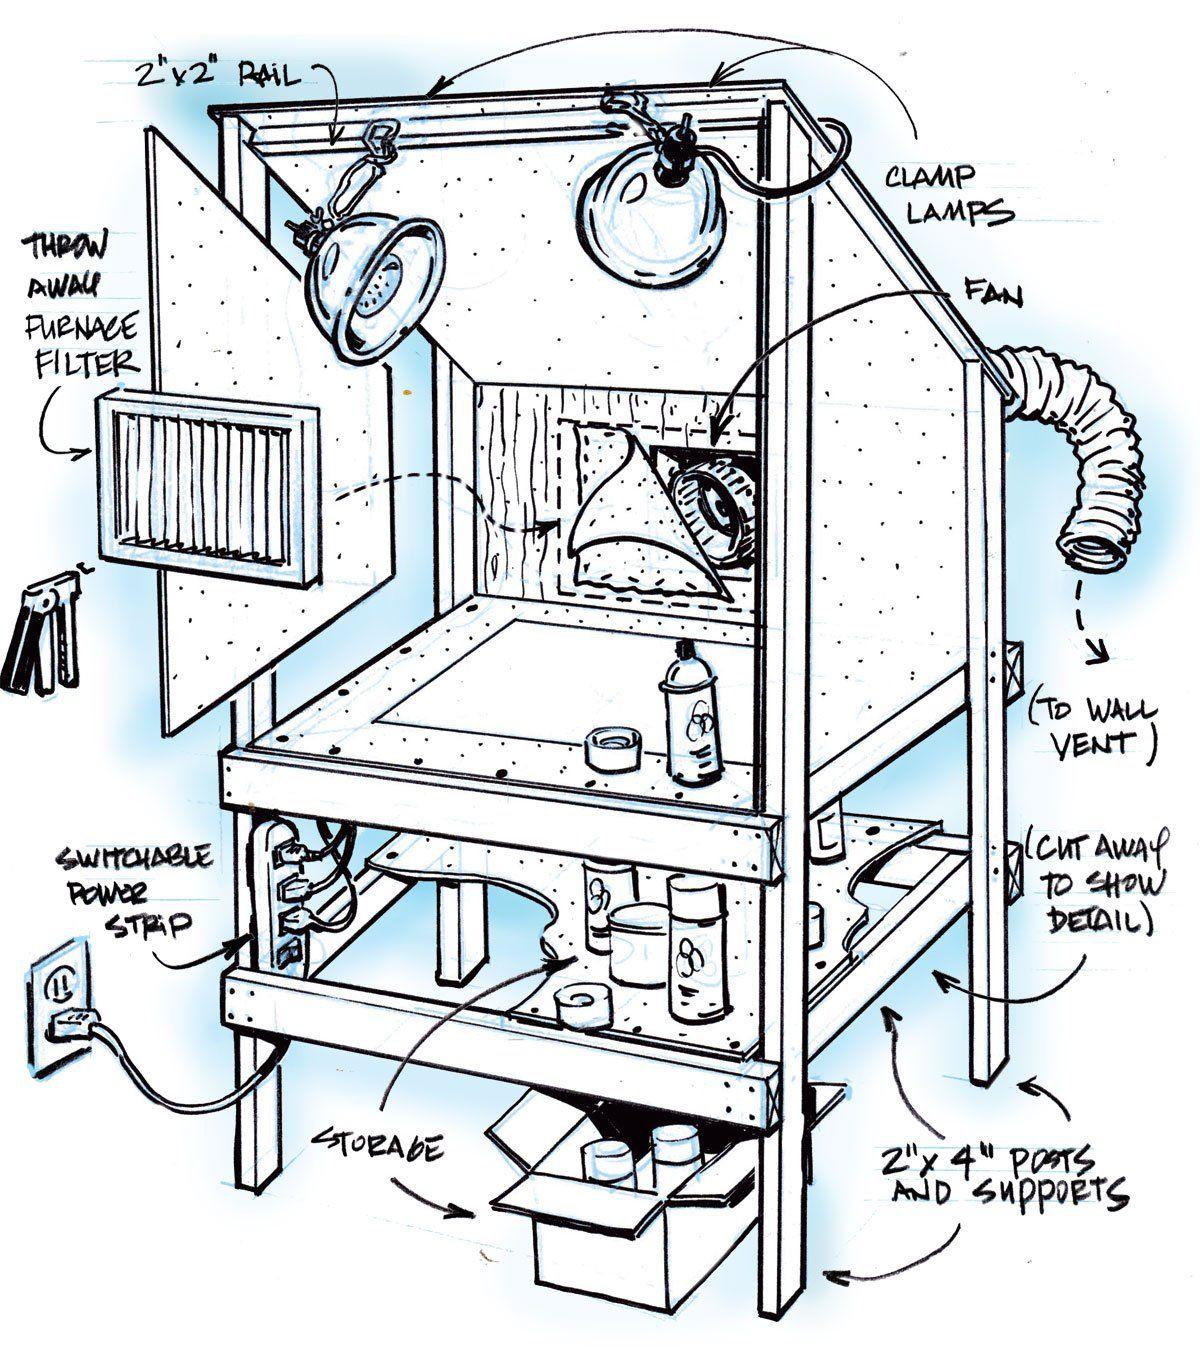 Toy Inventor's Notebook Stairwell Spray Booth